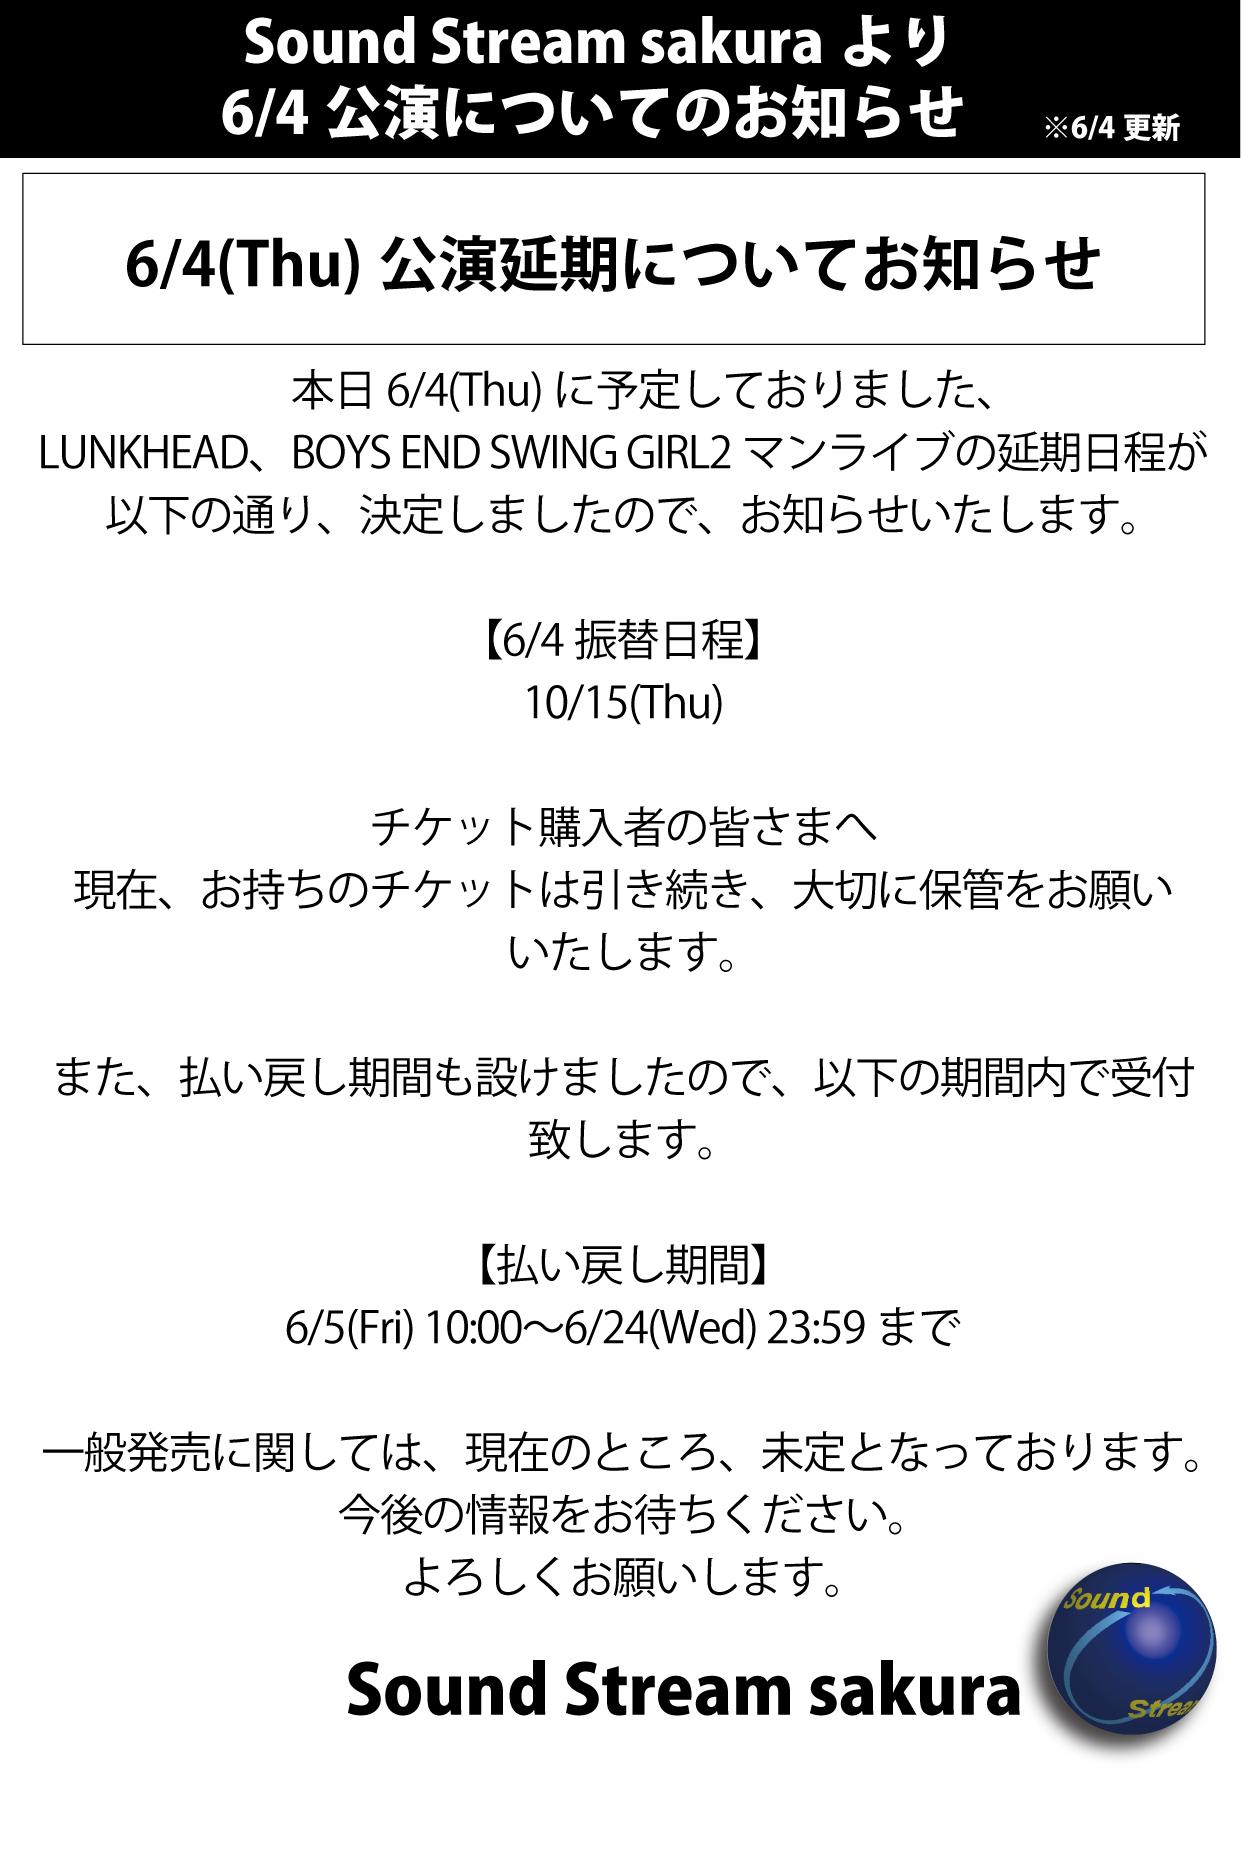 2020/06/04 Sound Stream sakura